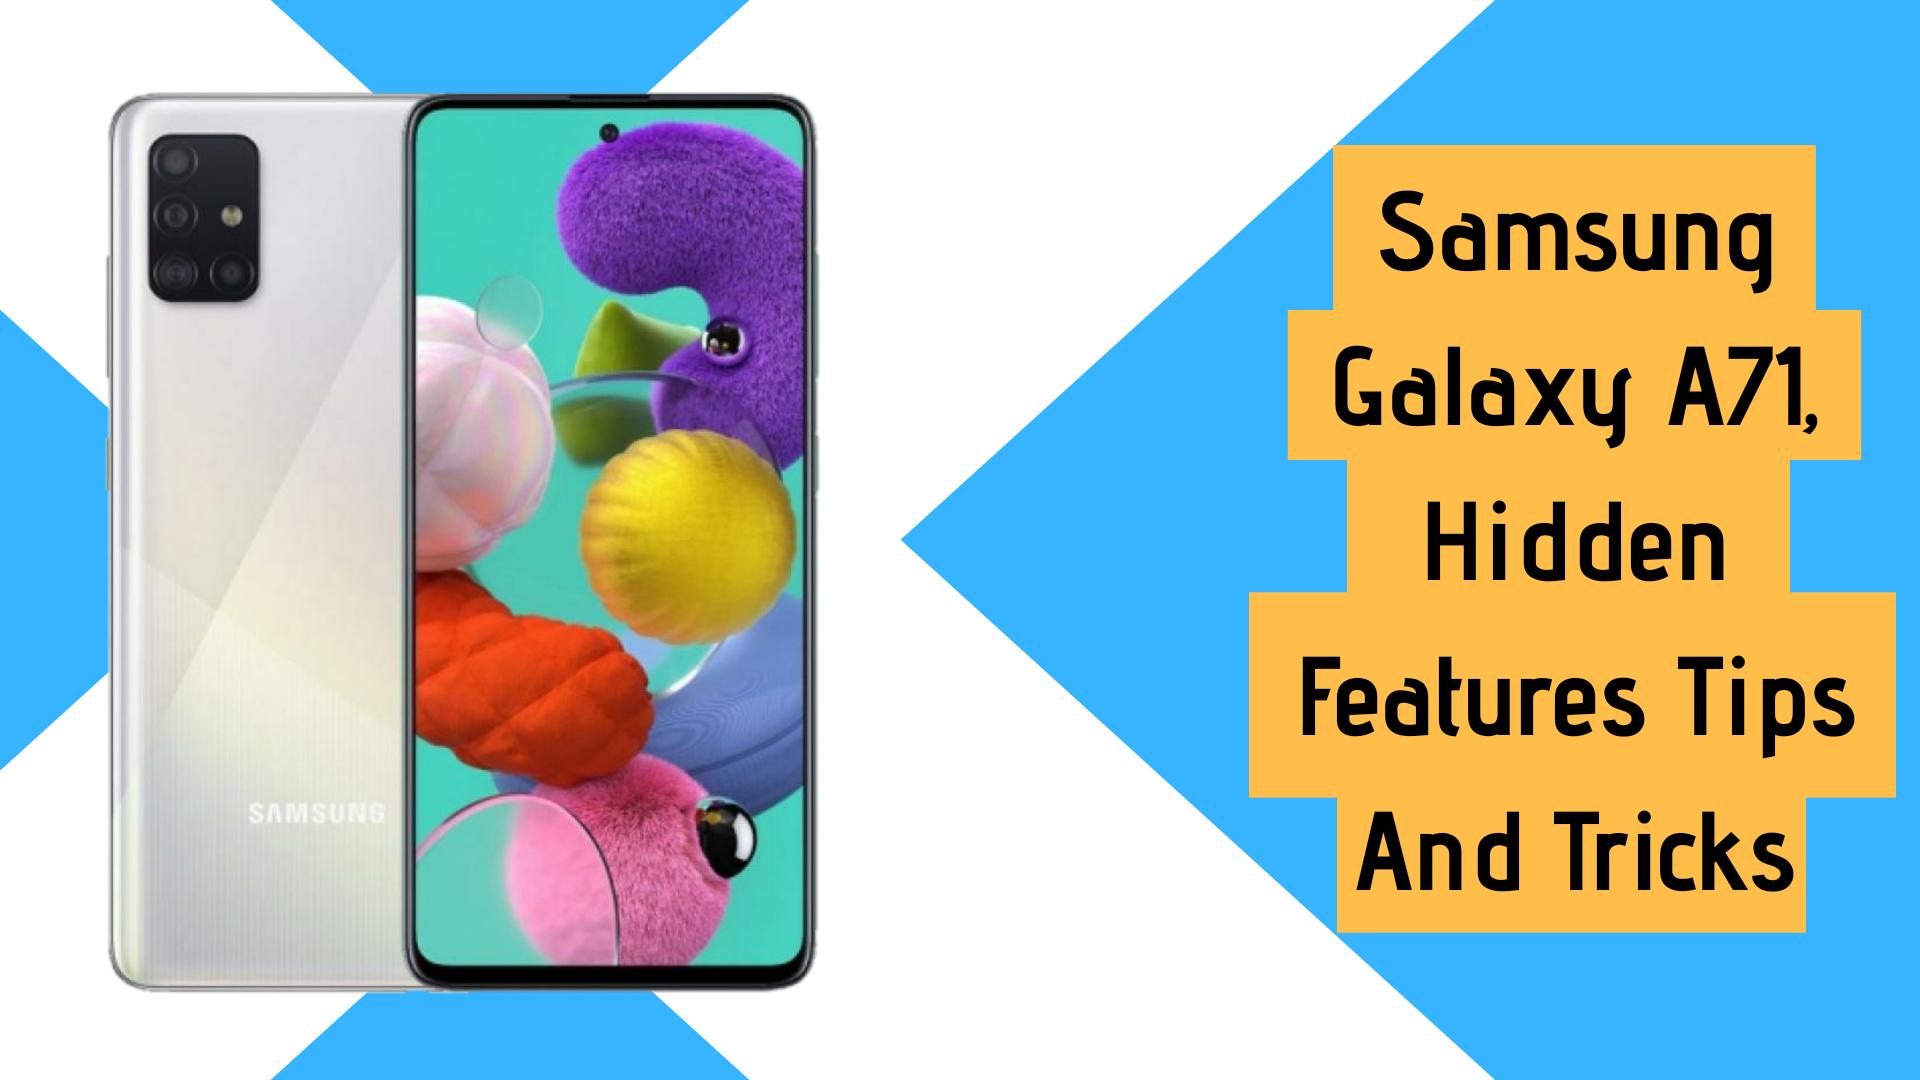 15 Best Samsung Galaxy A71 Hidden Features Tips And Tricks Gizdoc